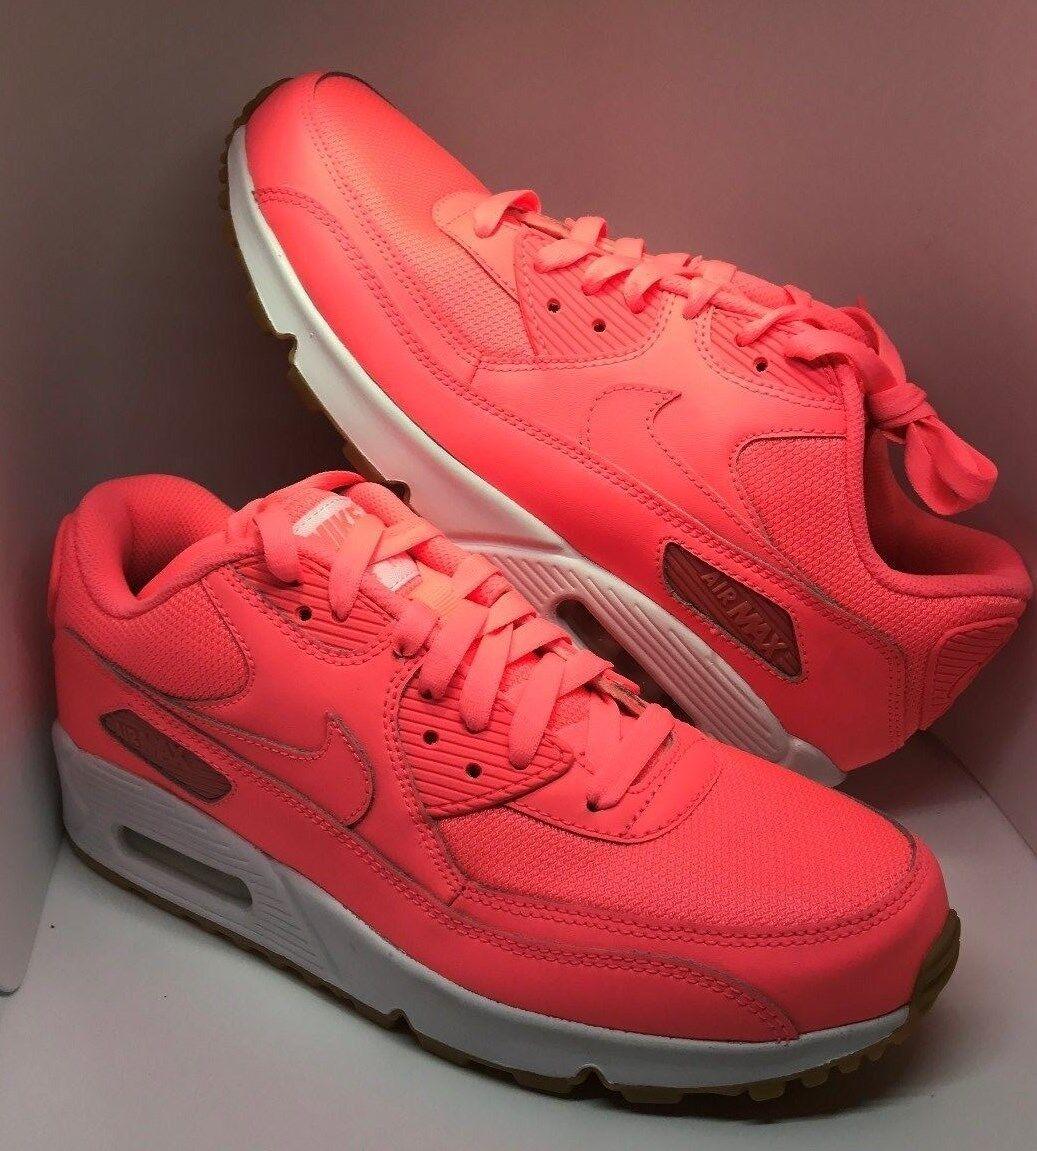 Nike iD Air Max 90 Women Women Women Running shoes Size 9.5 Hot Pink   White Gum Soles bc7130